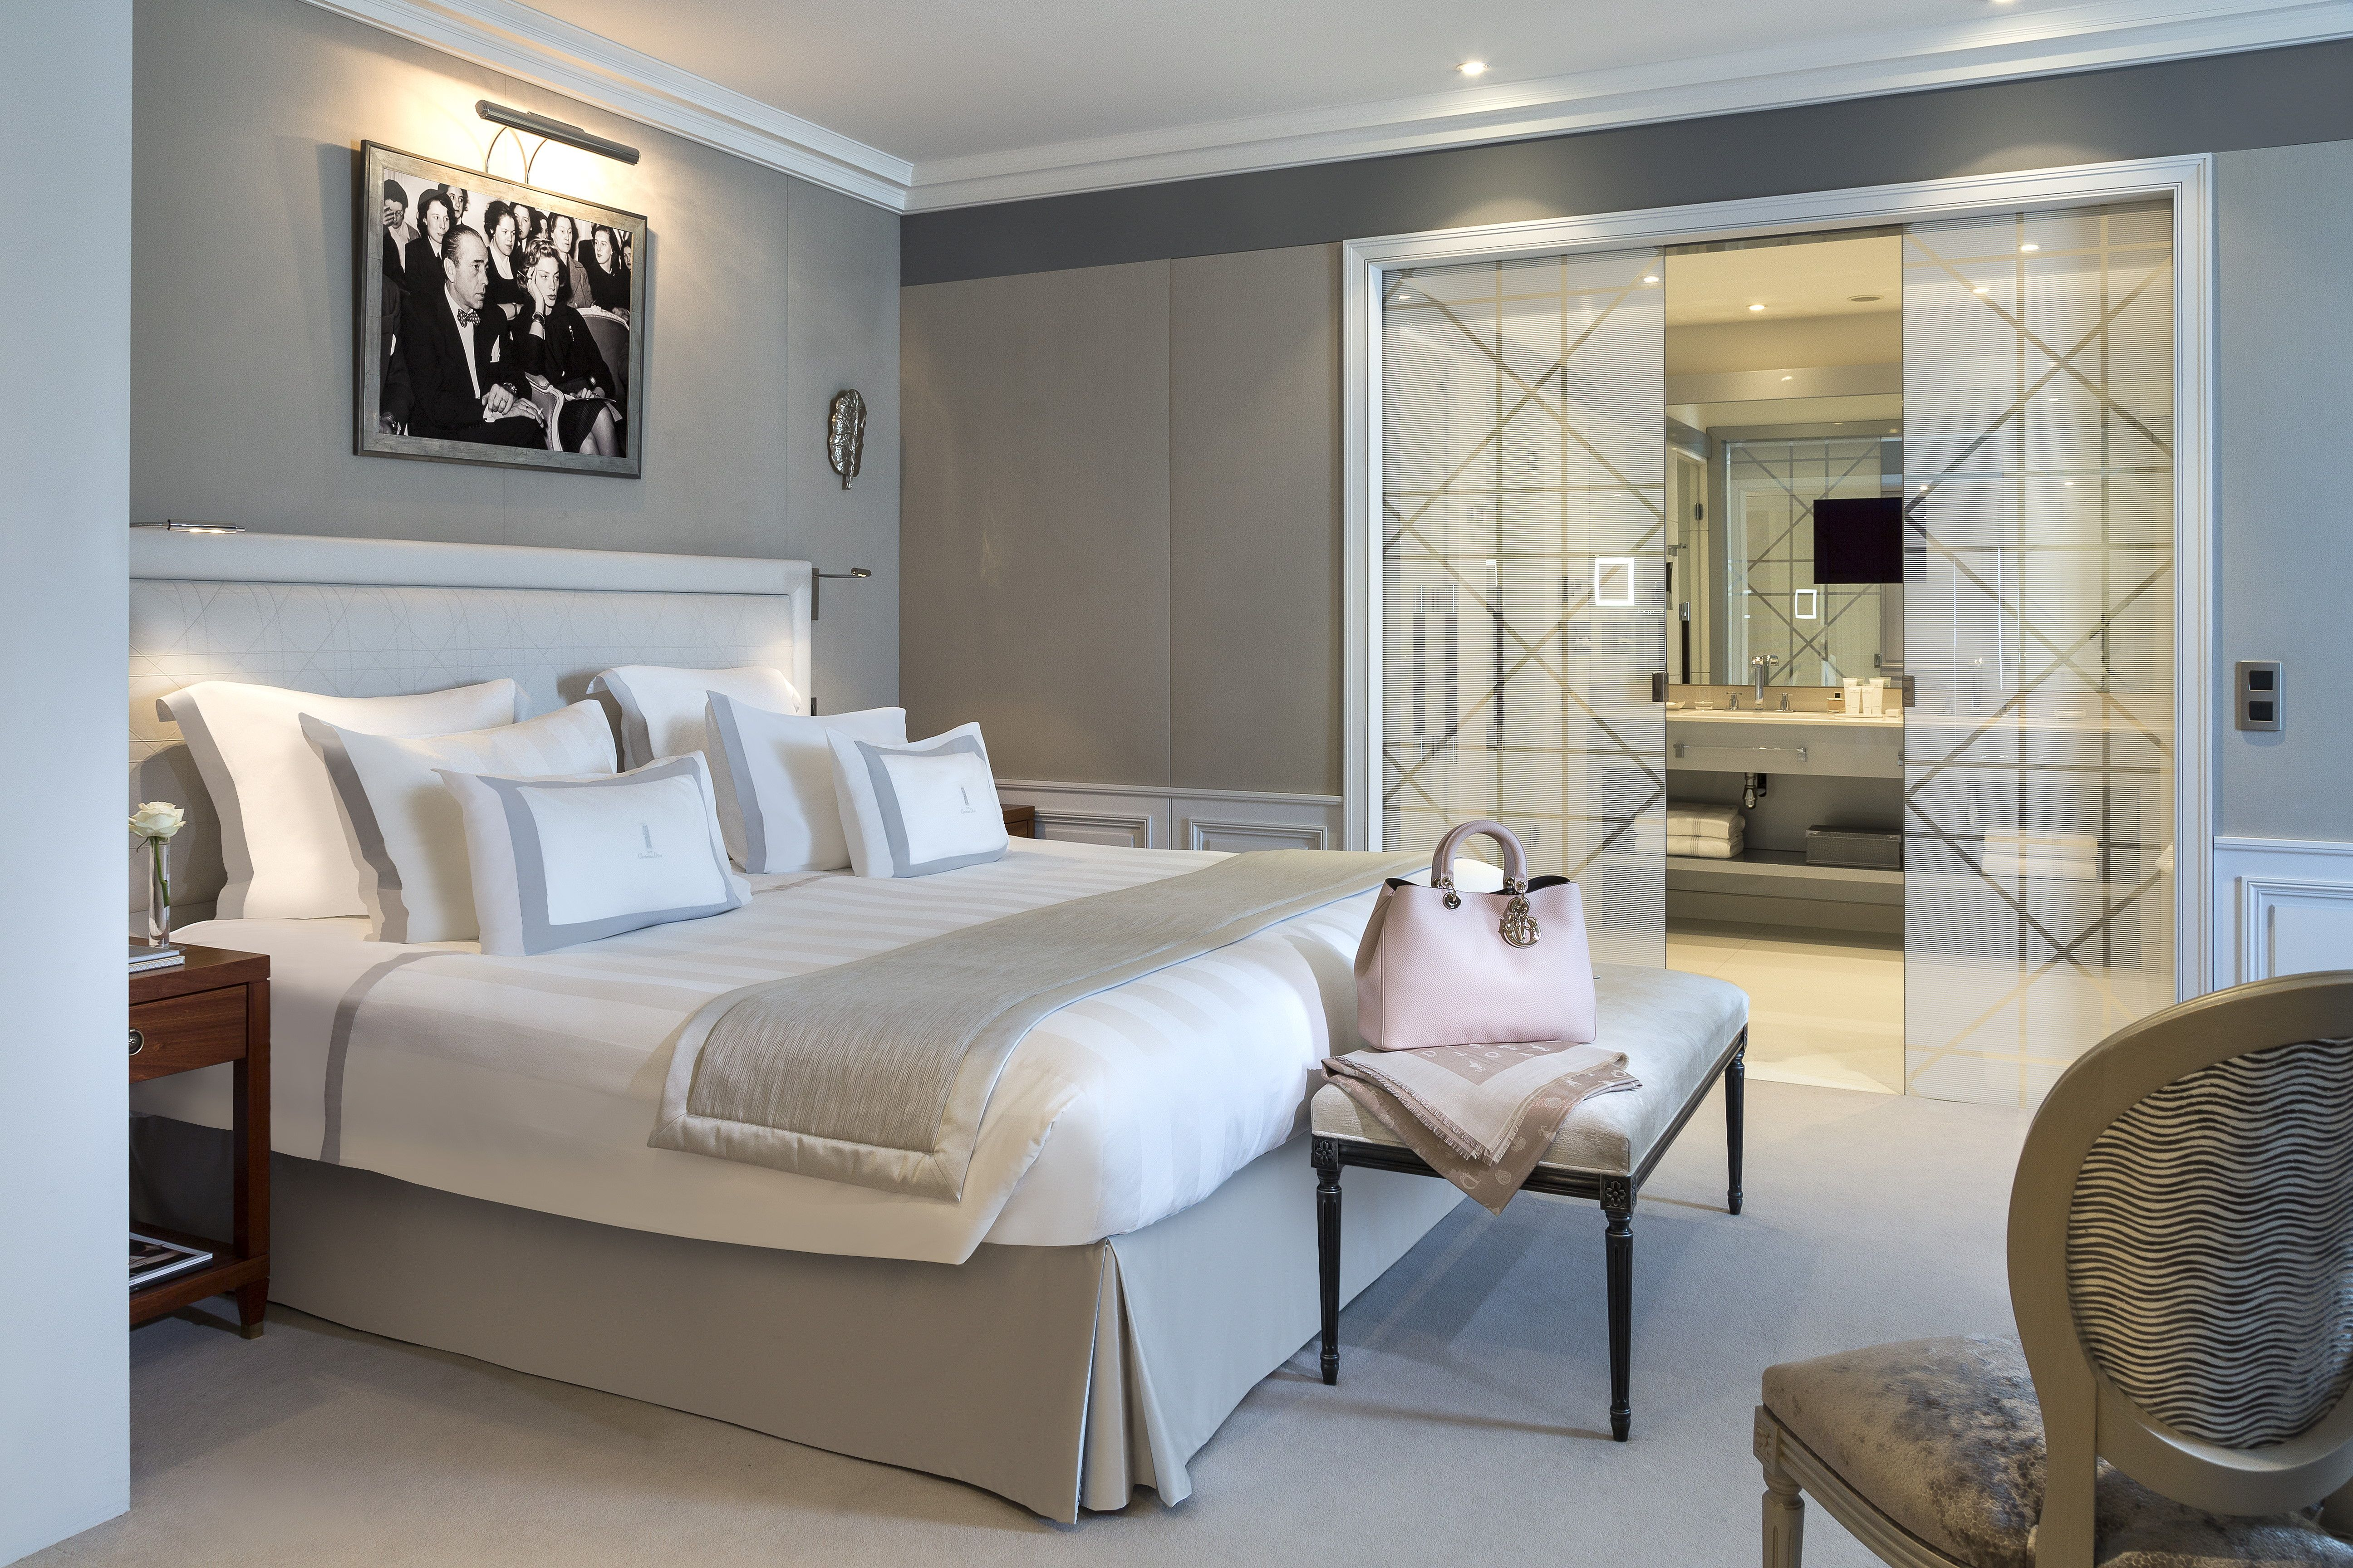 CHRISTIAN DIOR SUITE Prestigious Penthouse Upscale Room Majestic